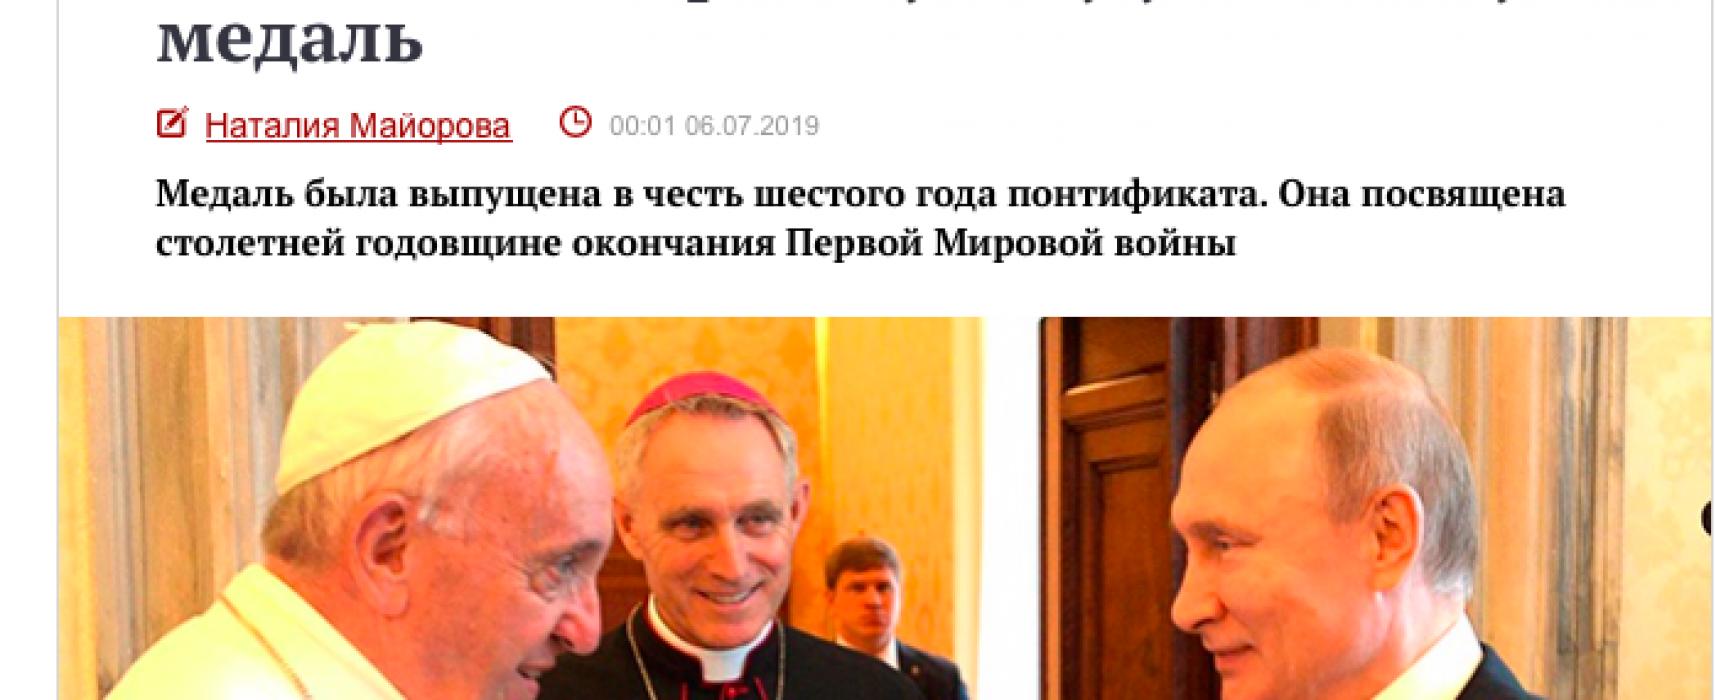 "Fake: Papež udělil Putinovi medaili ""Anděl míru"""